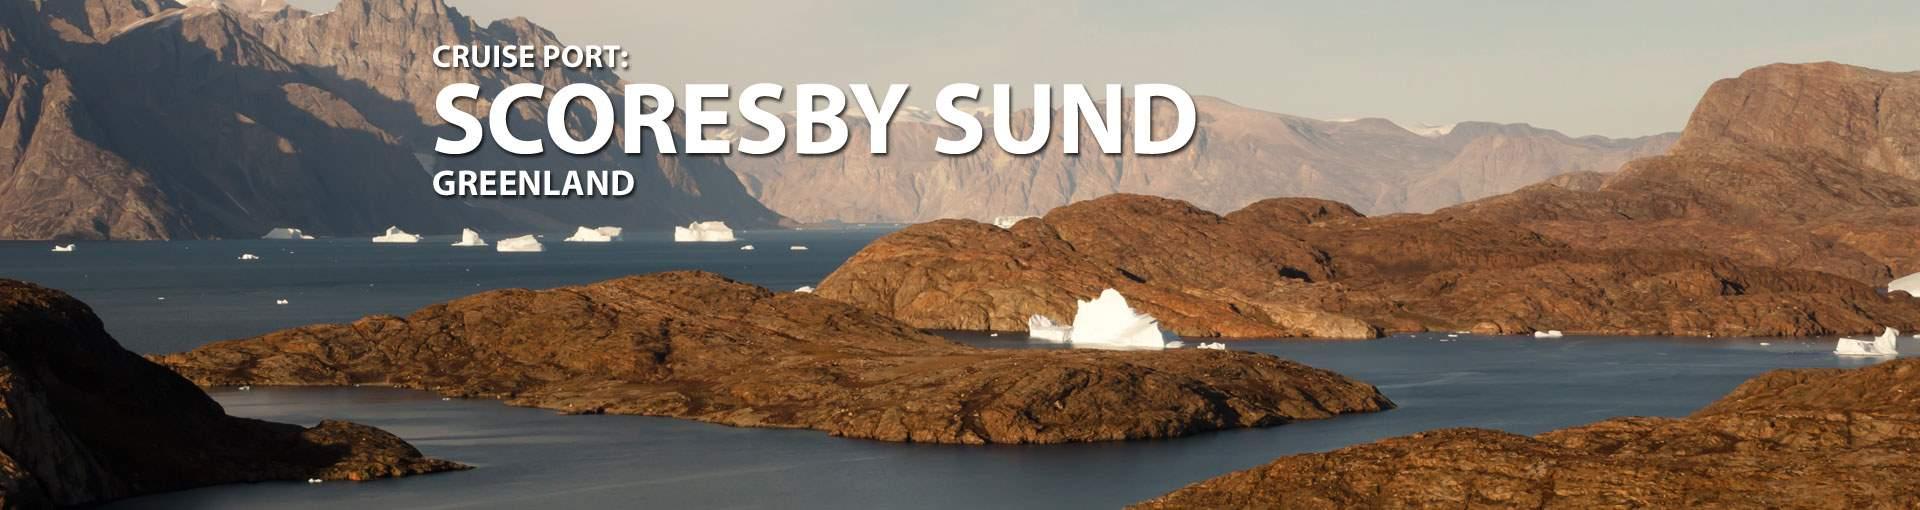 Cruises to Scoresby Sund, Greenland